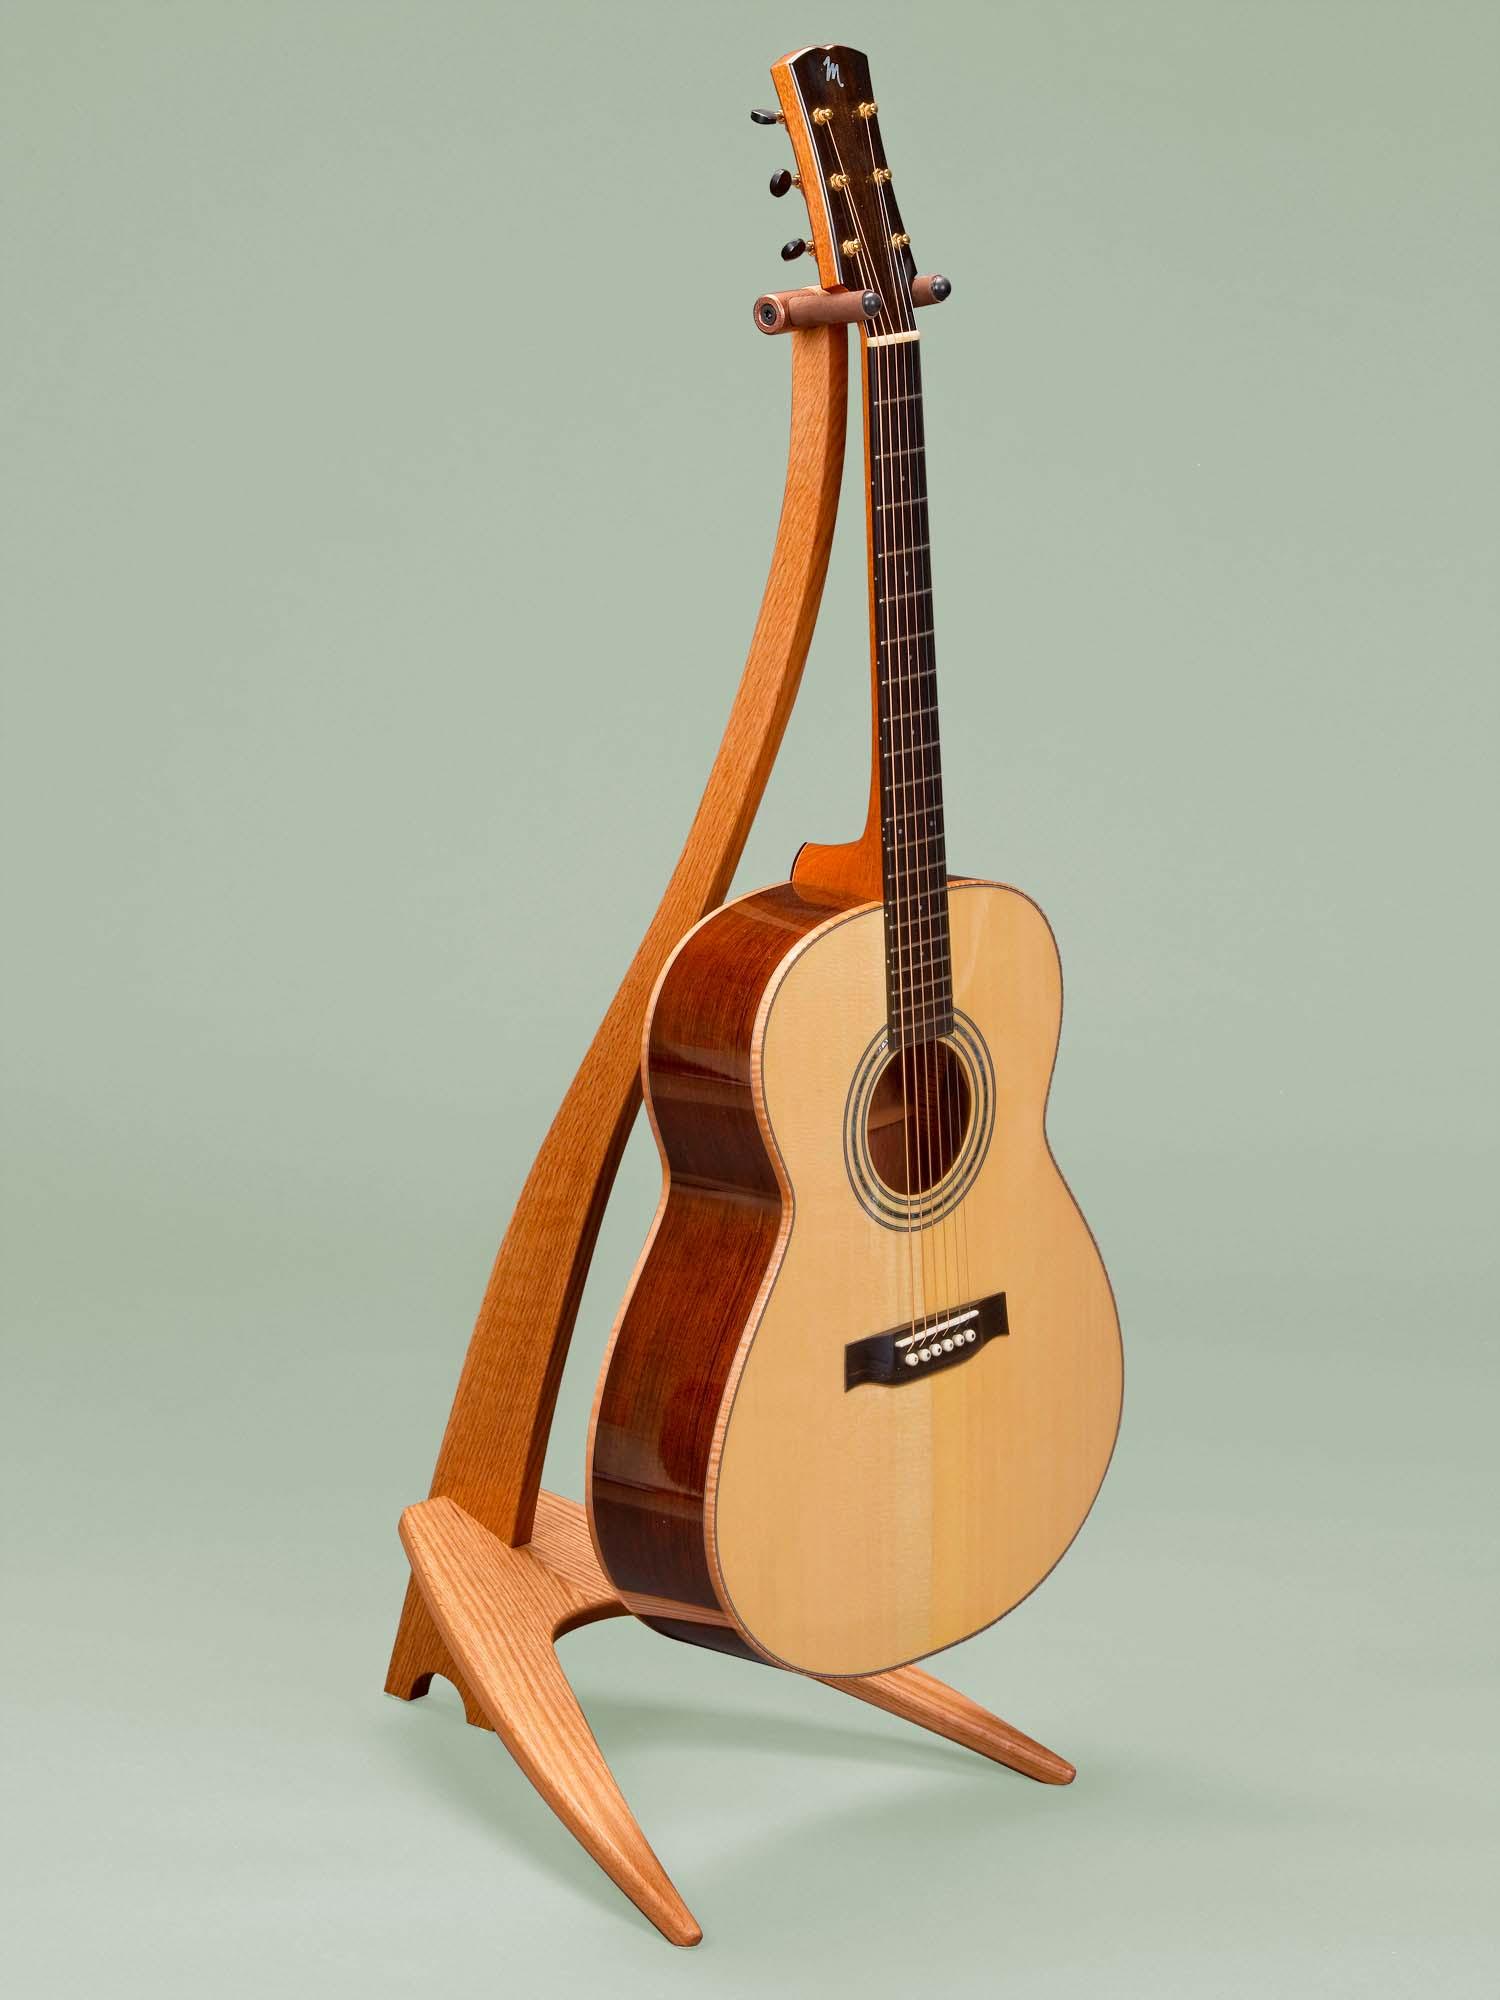 Wm Guitar Stands In Stock